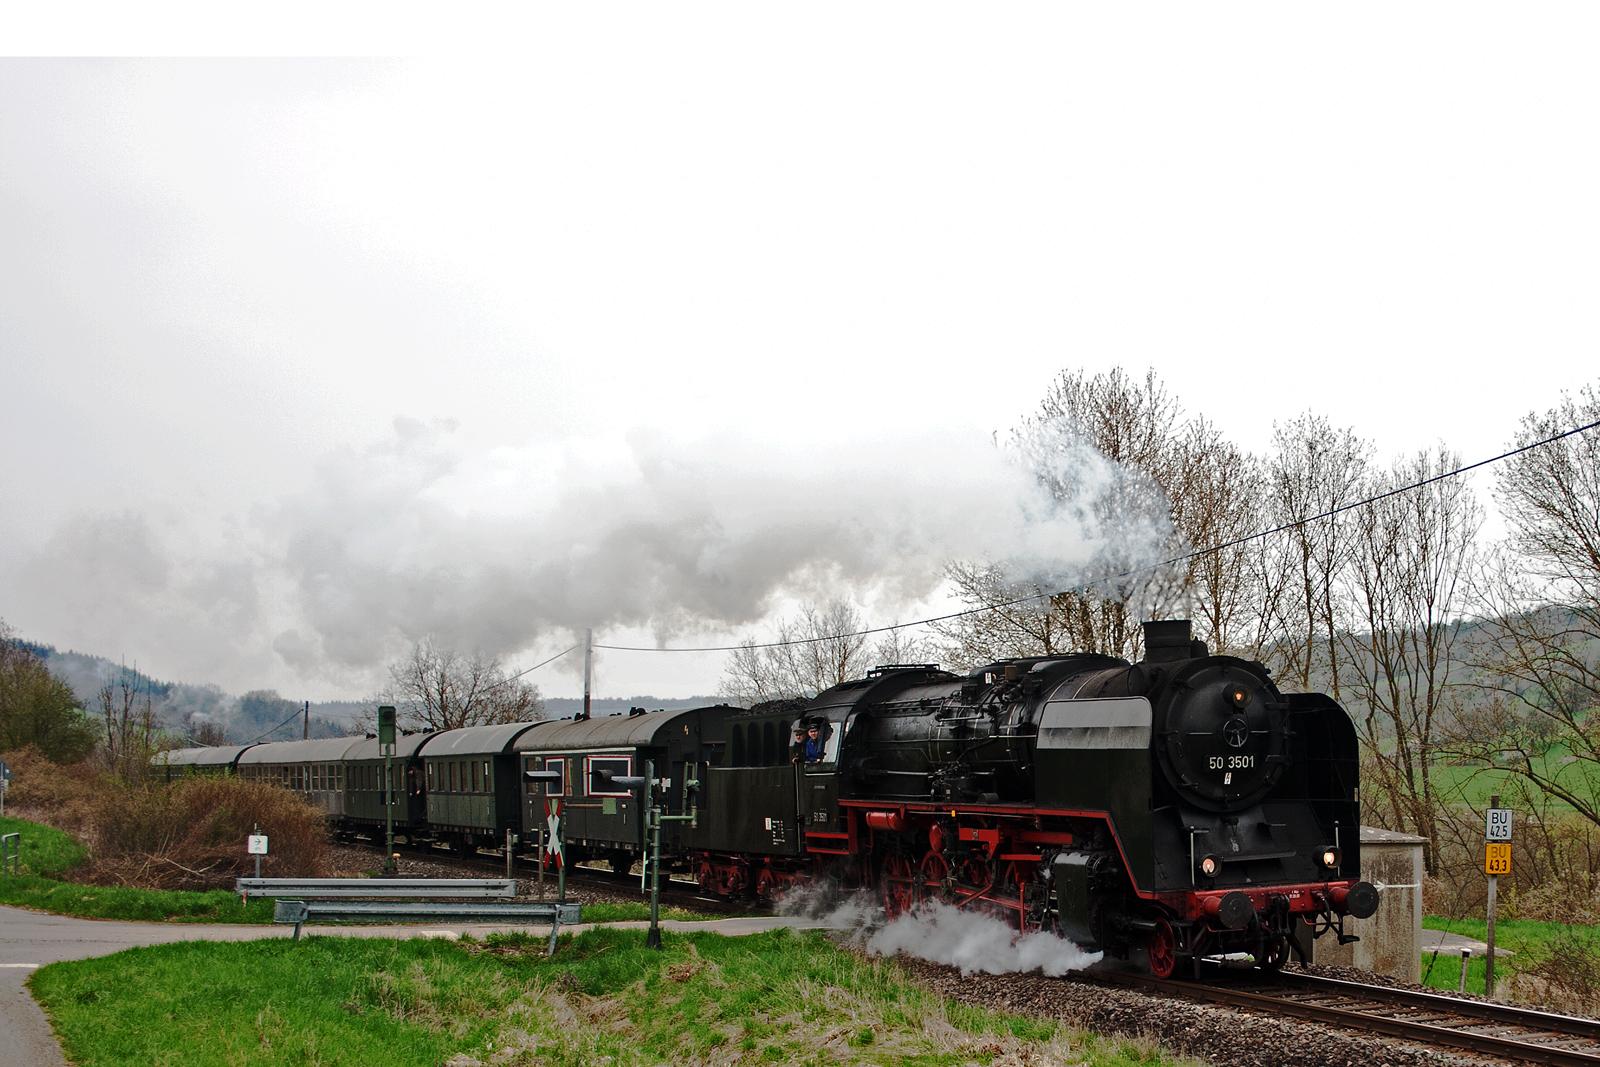 BR 50 3501